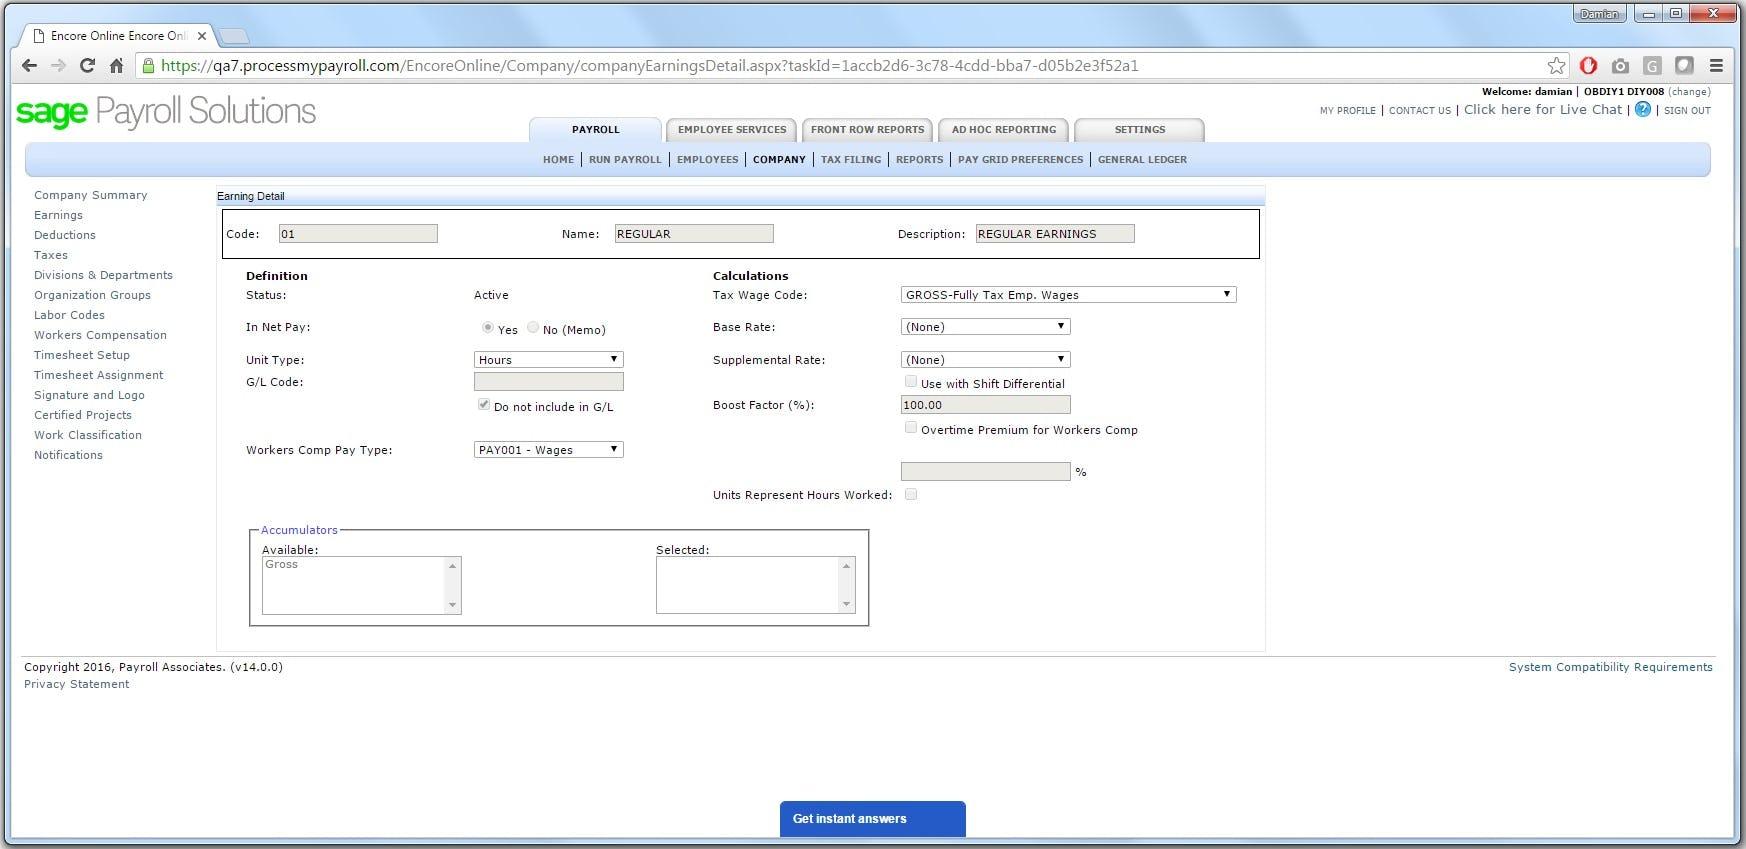 Sage Payroll - Earning Details